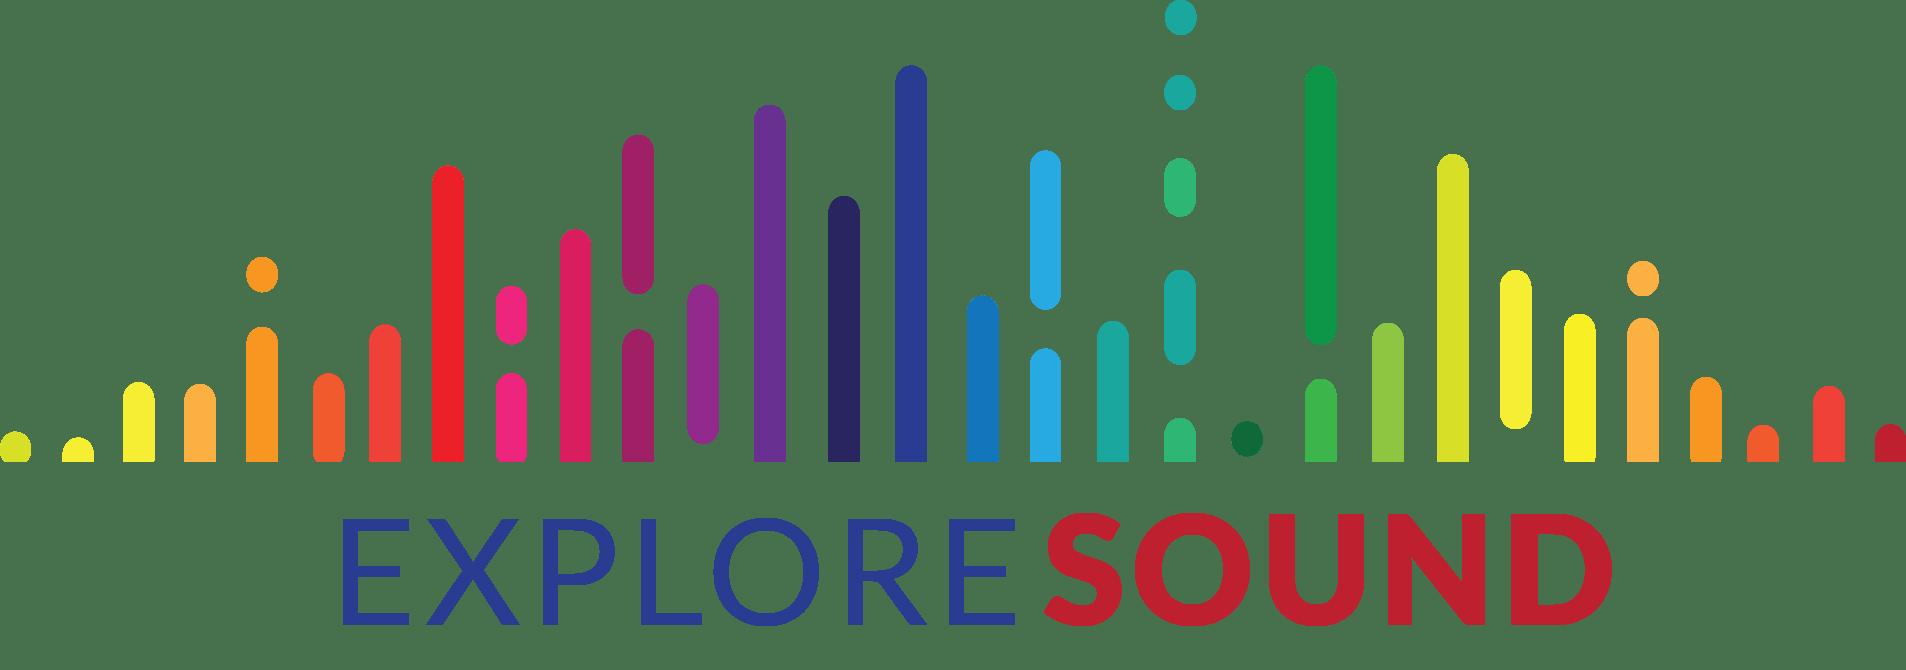 Terms & Definitions - Explore Sound